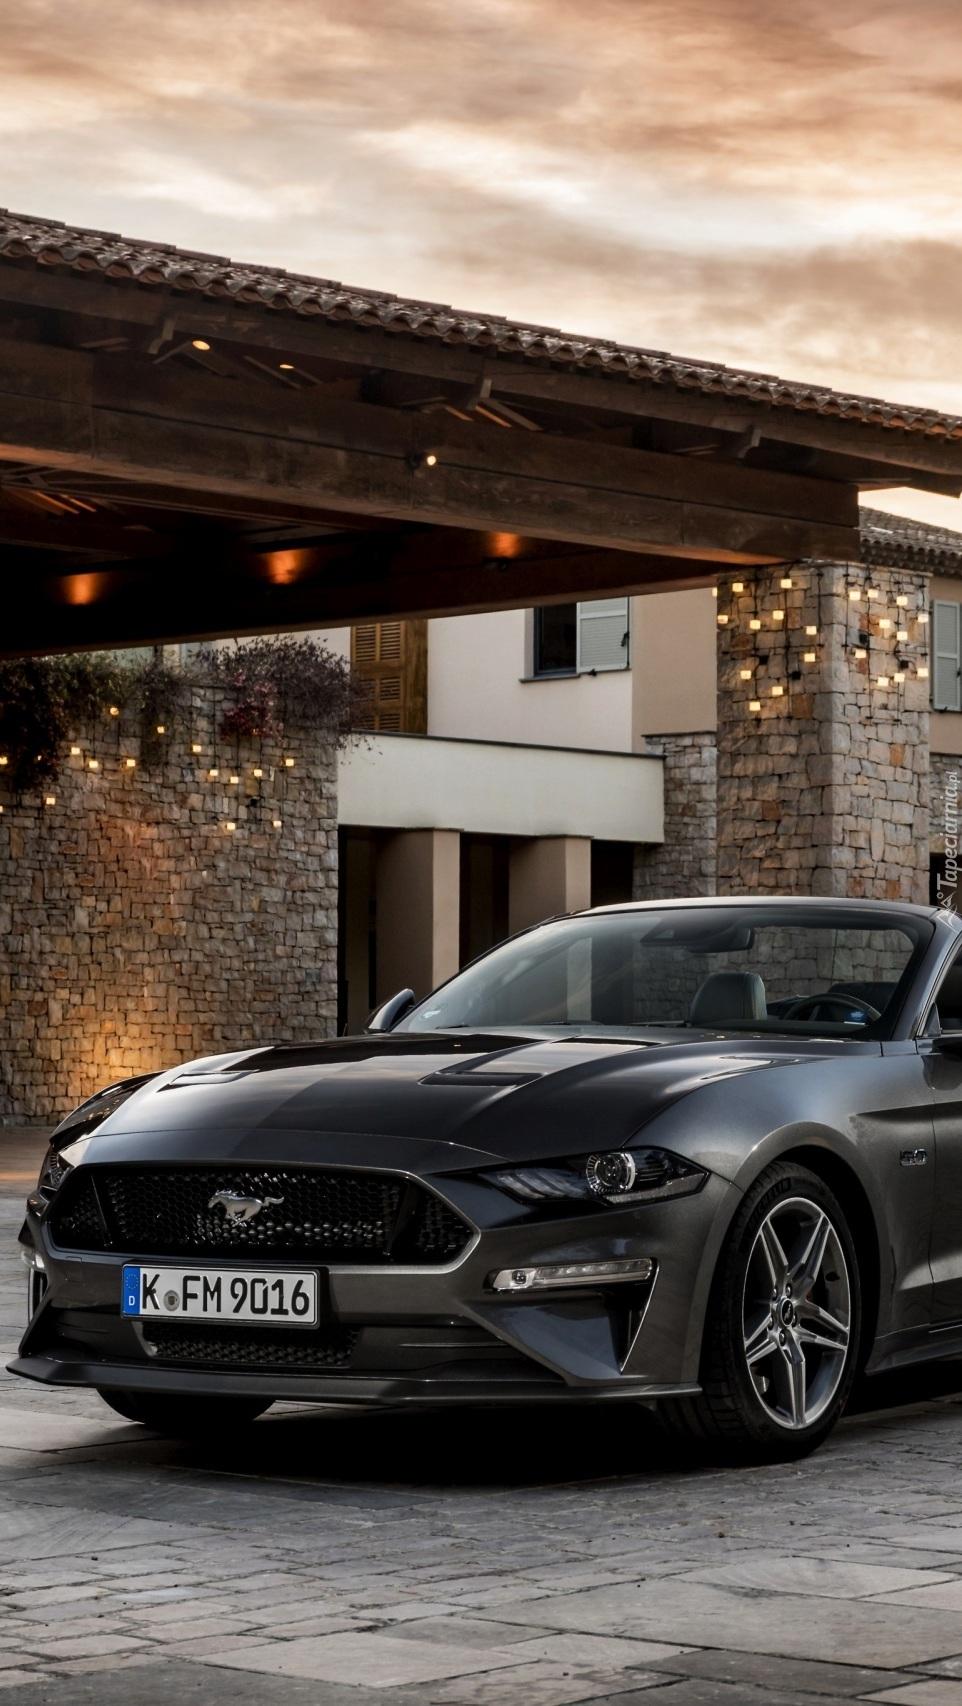 Ford Mustang GT przed domem